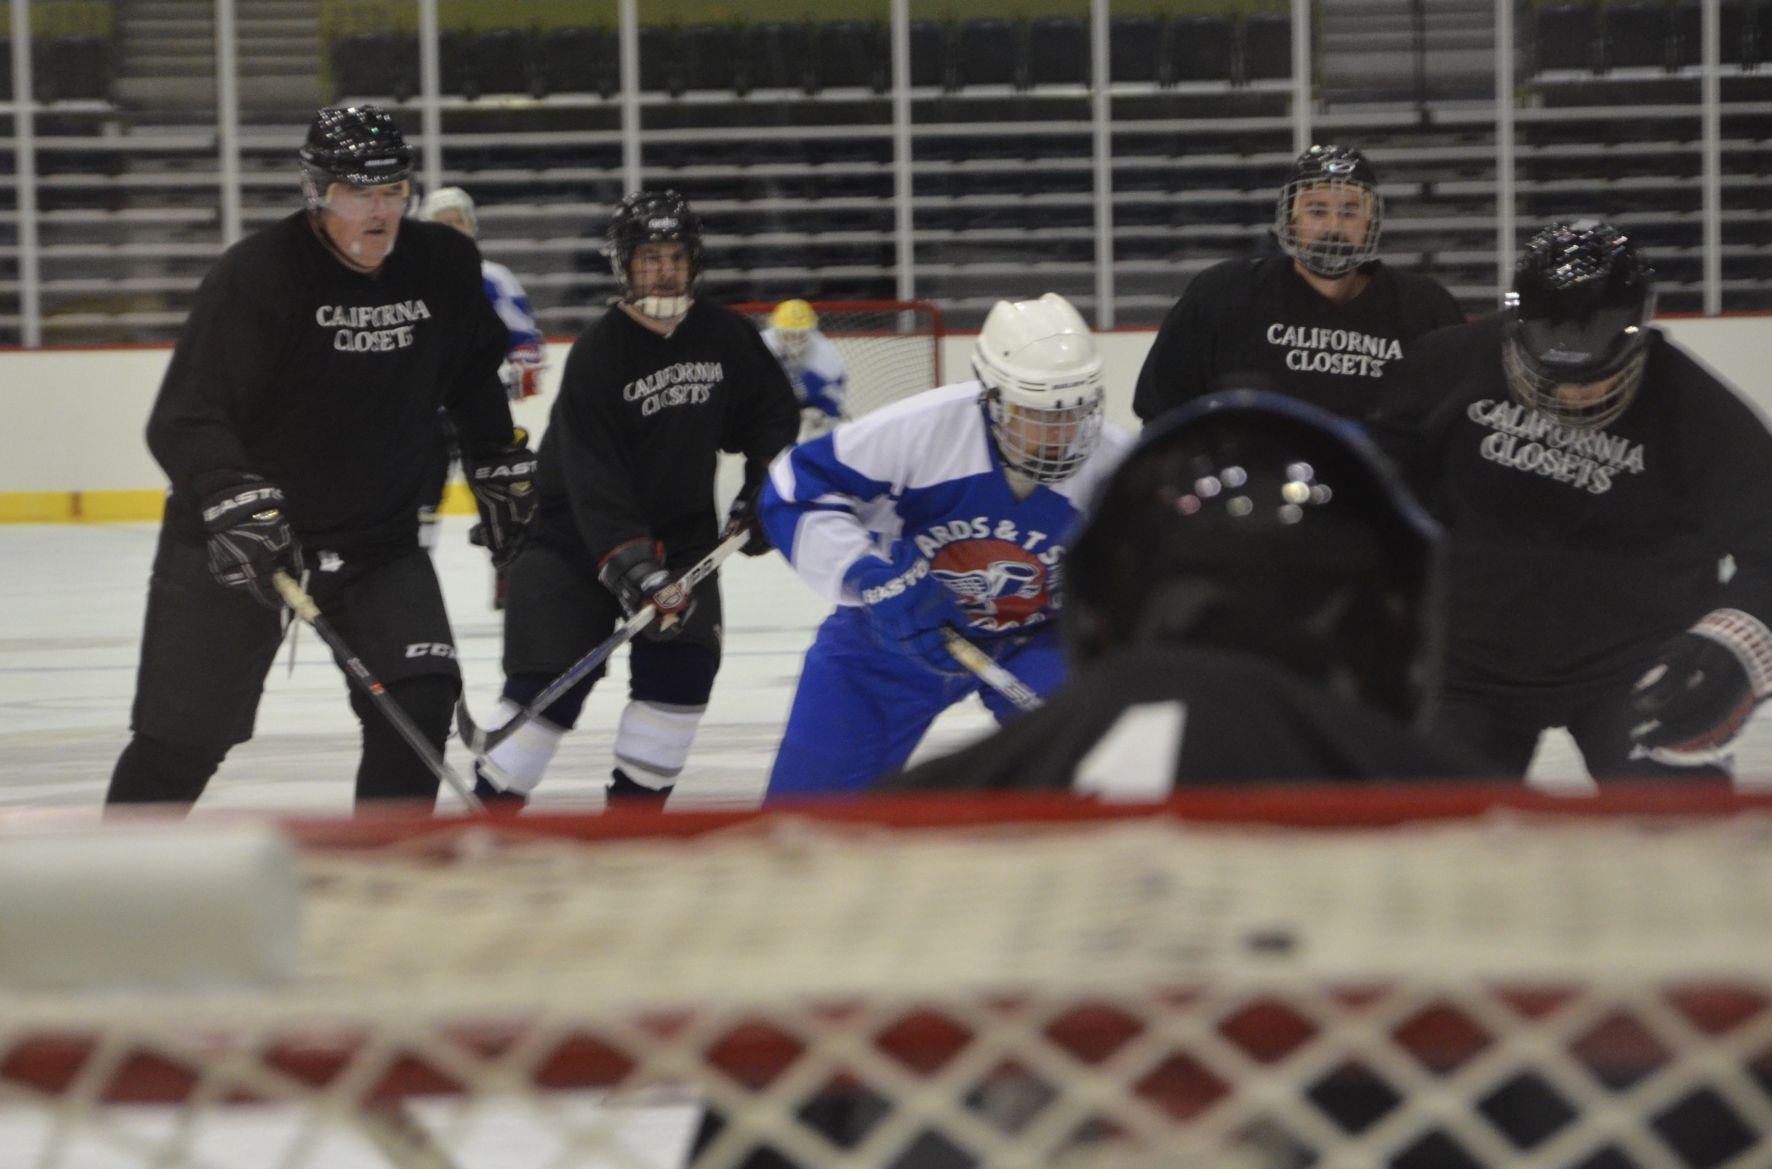 Tucson Adult Hockey League